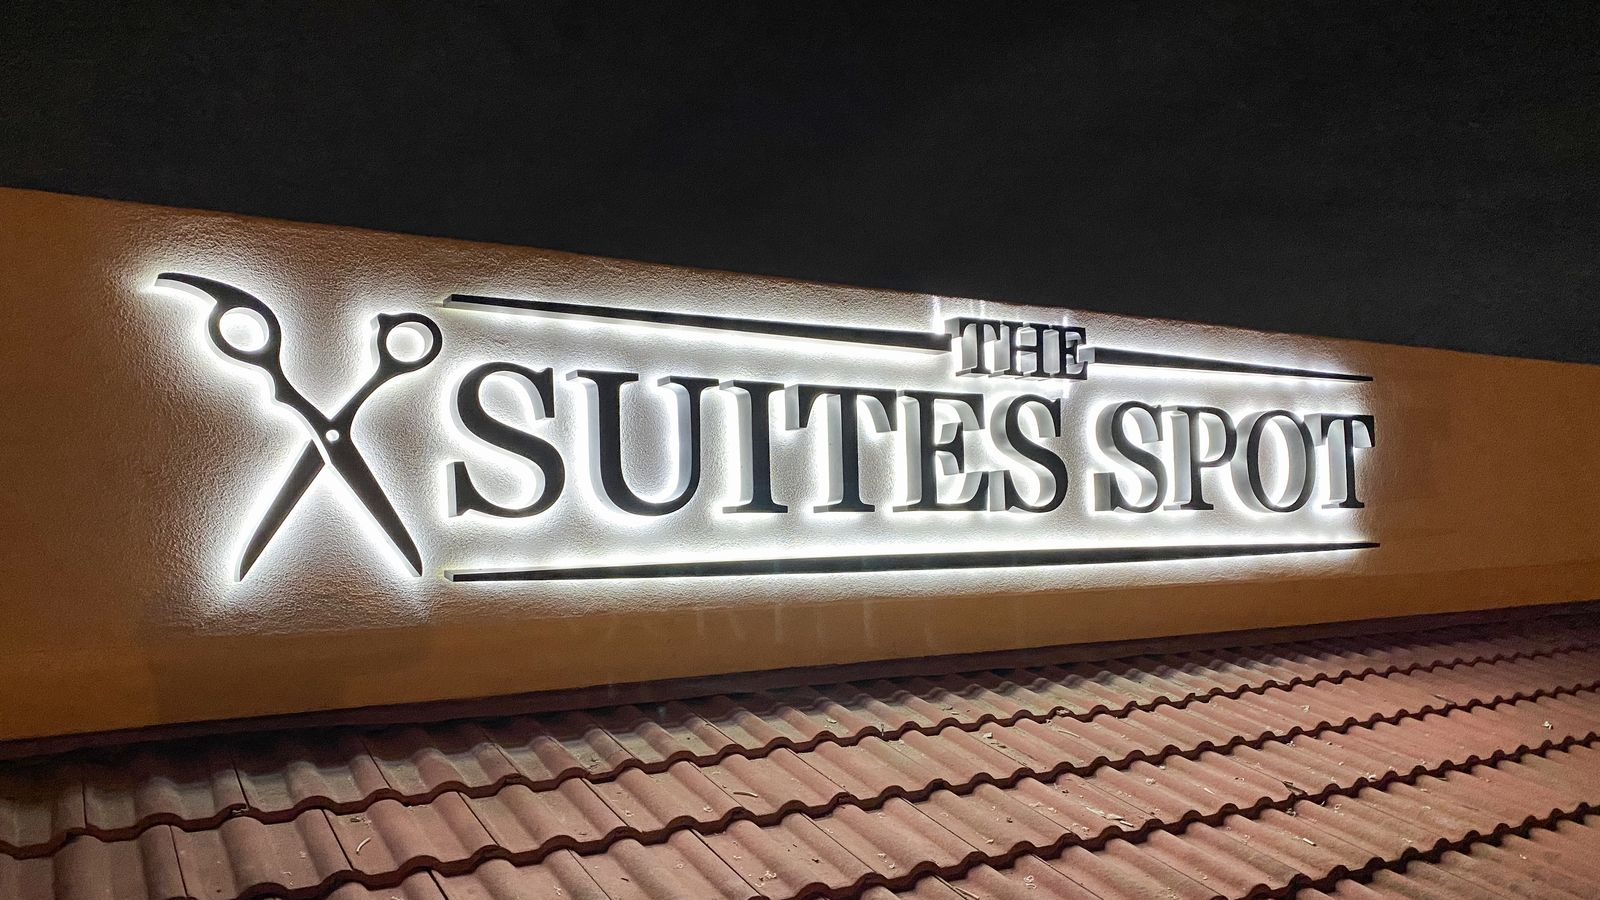 Suites Spot backlit letters